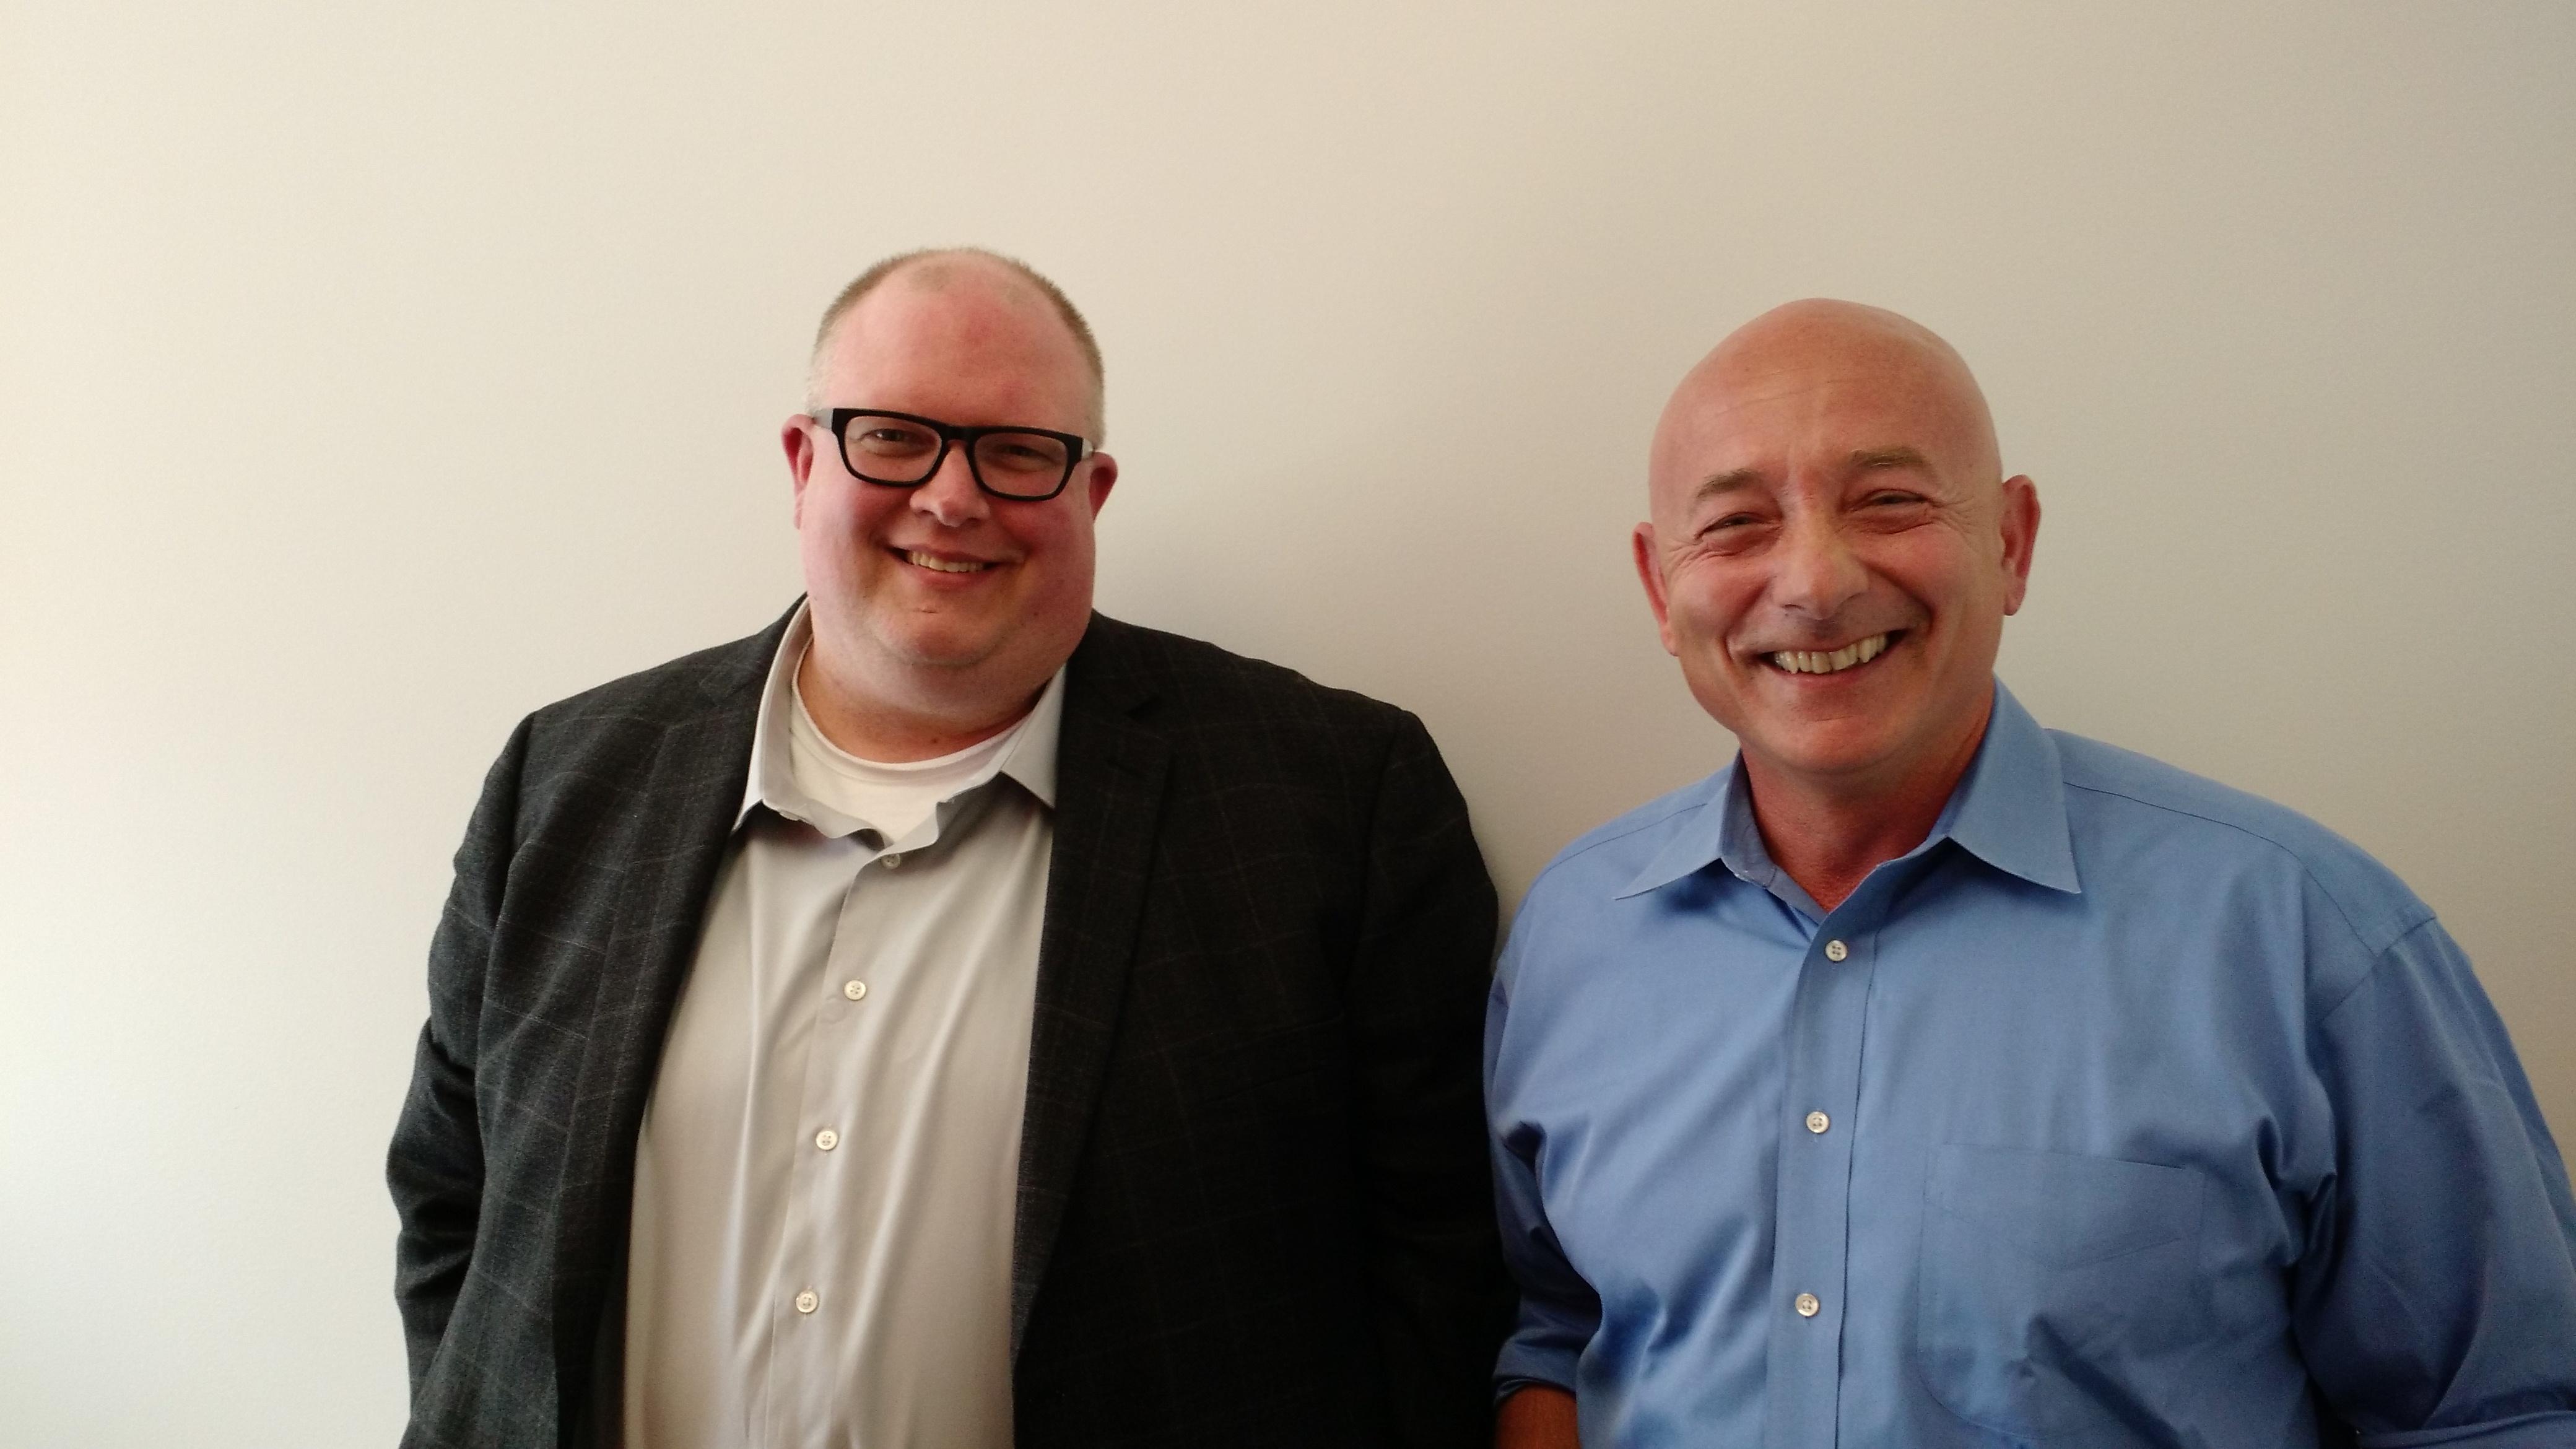 Maana cofounders Donald Thompson, left, and Babur Ozden.